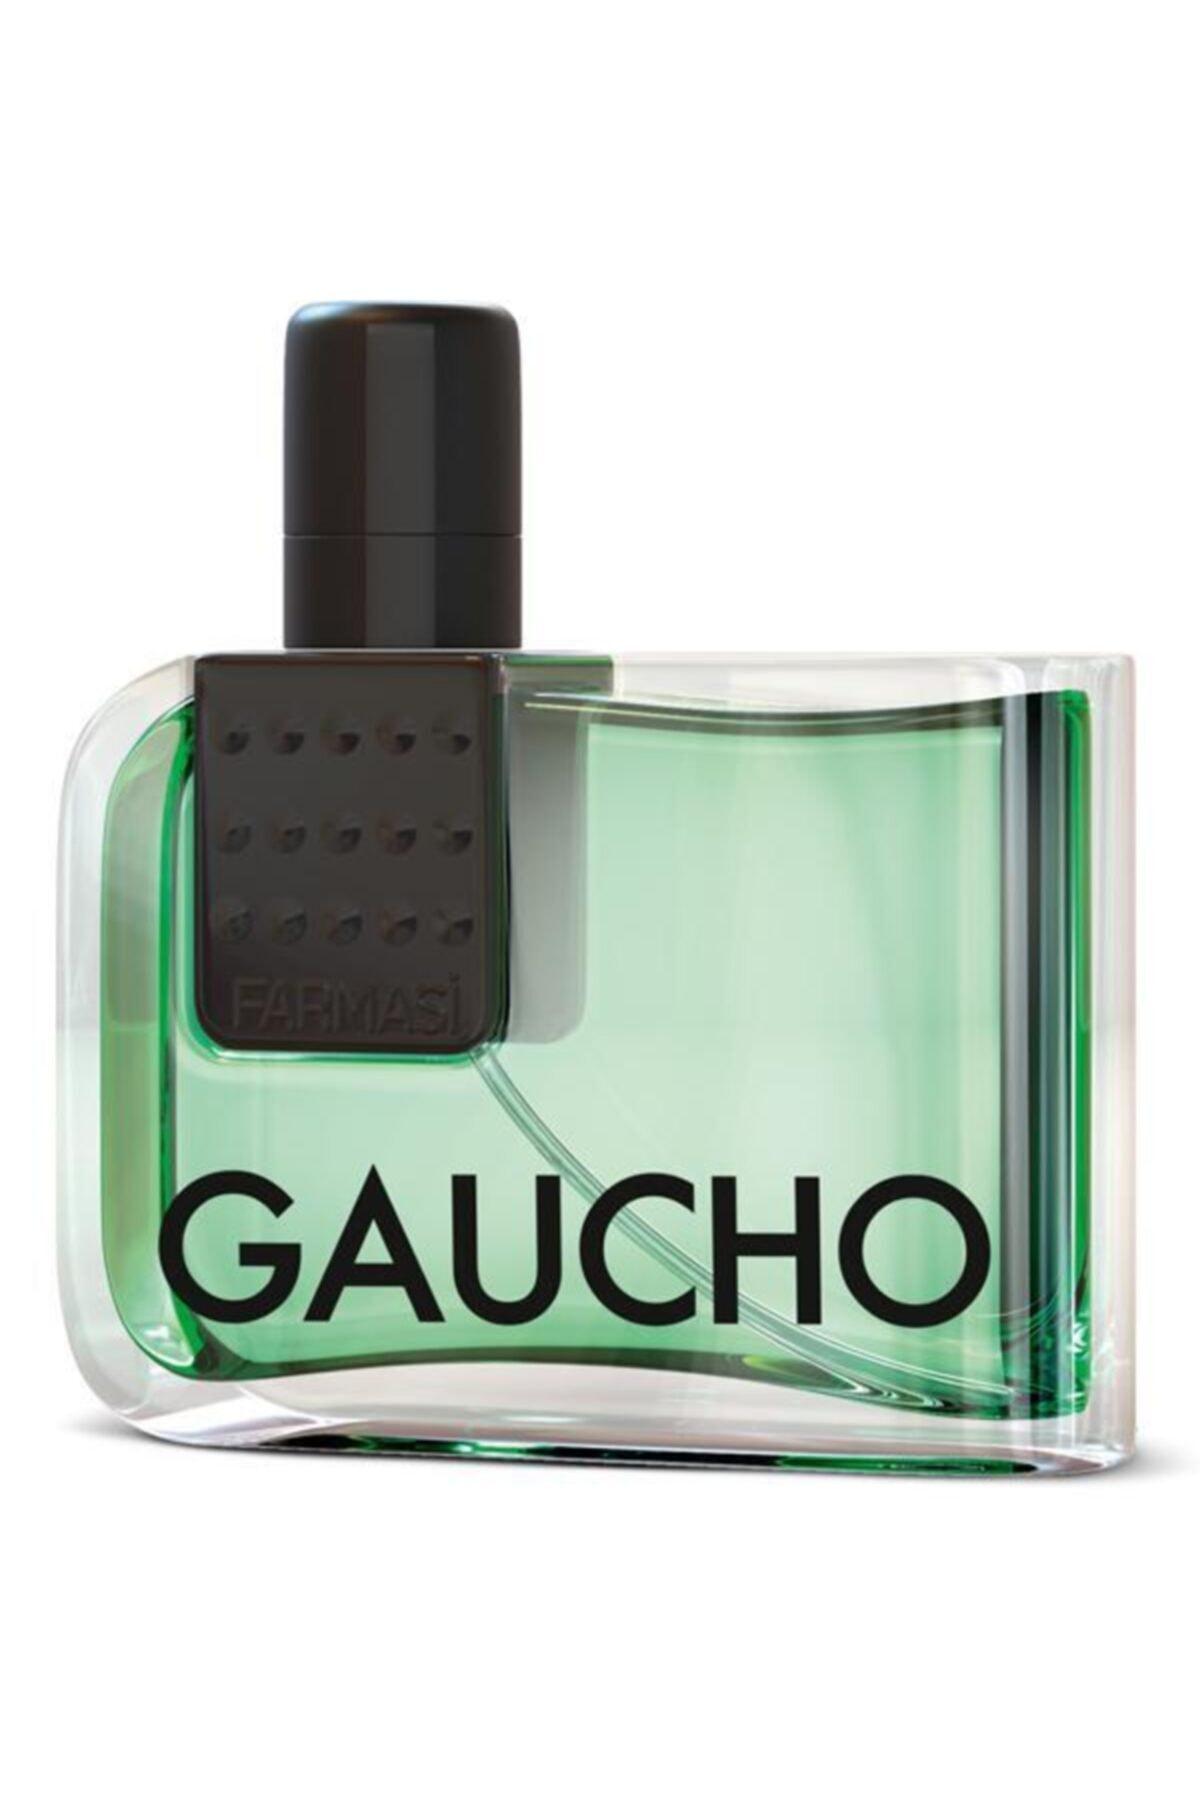 Farmasi Gaucho Edp Erkek Parfümü 100 Ml 1